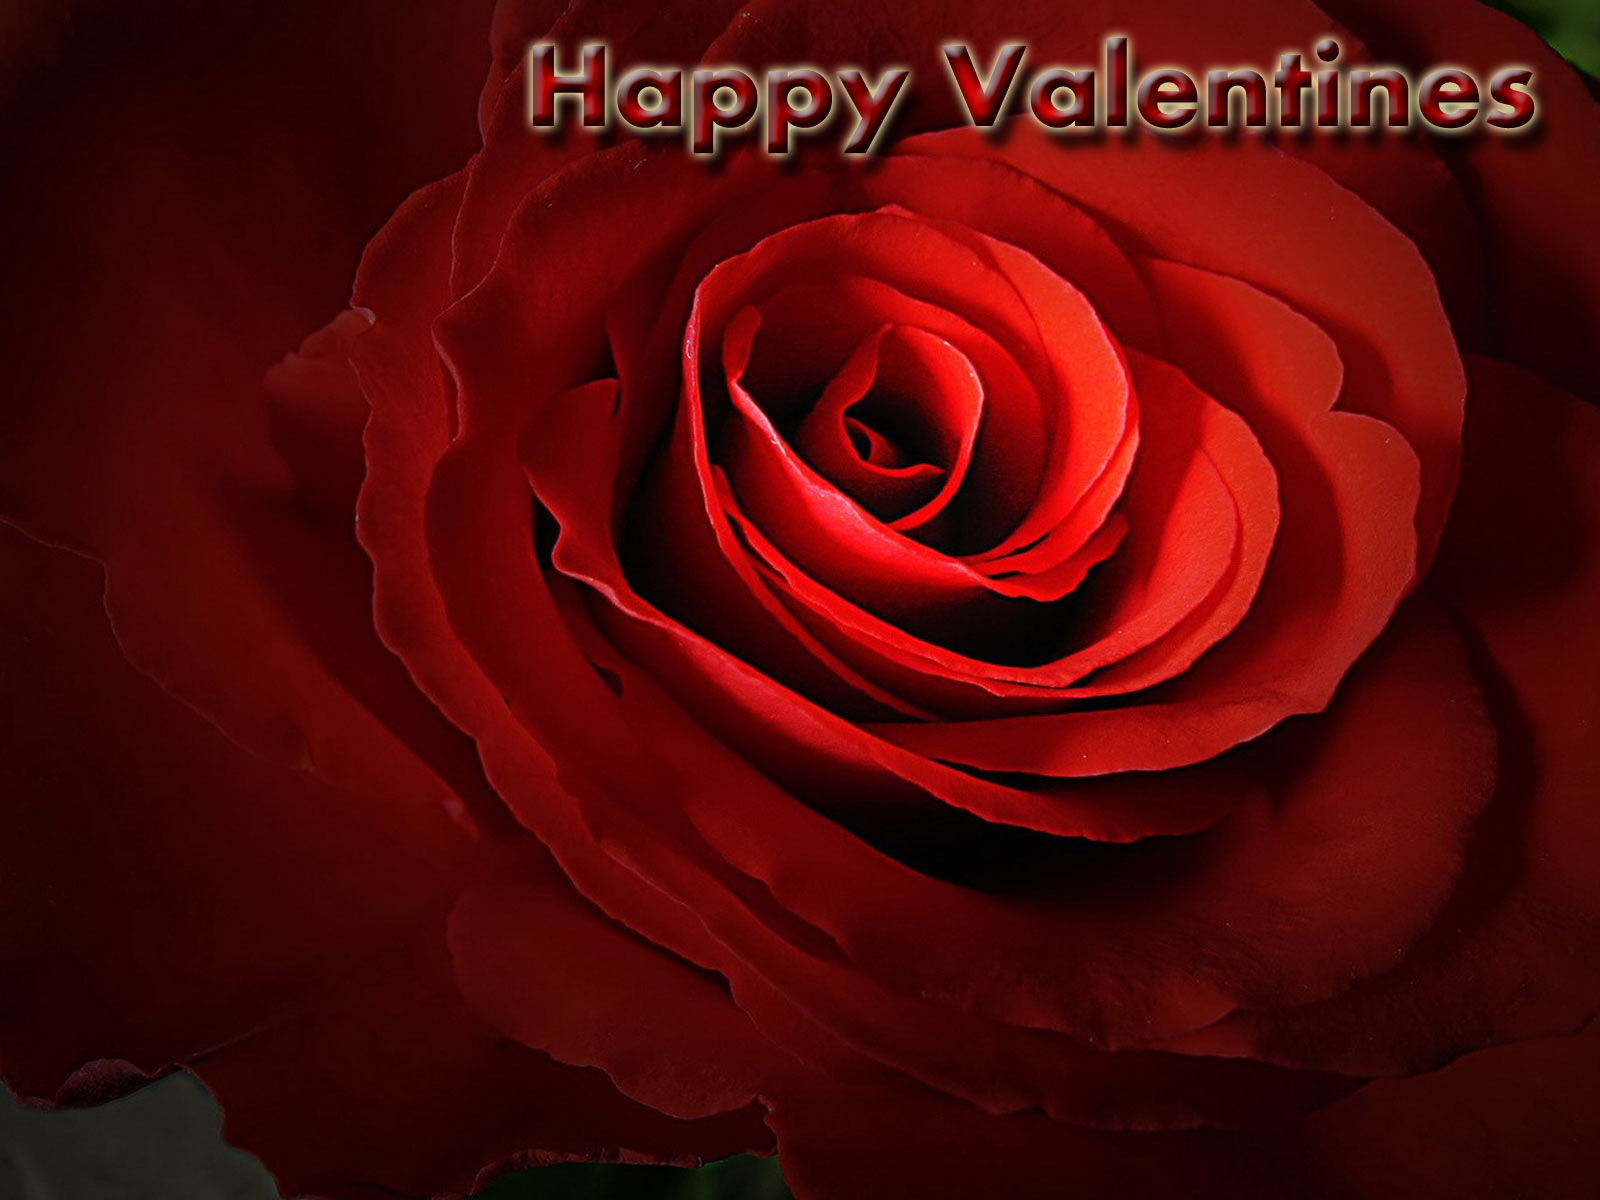 http://2.bp.blogspot.com/-OQ3anOPZa74/TVabfECBV2I/AAAAAAAAFVo/Ld_uRreBmJU/s1600/Free-Valentines-Day-Desktop-Wallpaper-Final-Fantasy-HD-Wallpaper-1Salma_Hayek-sophie-choudhary-Alessandra-Ambrosio-Adriana%2BLim-emma-roberts-Love-wallpapers-romantic-hermione-granger-emma-watson.jpg